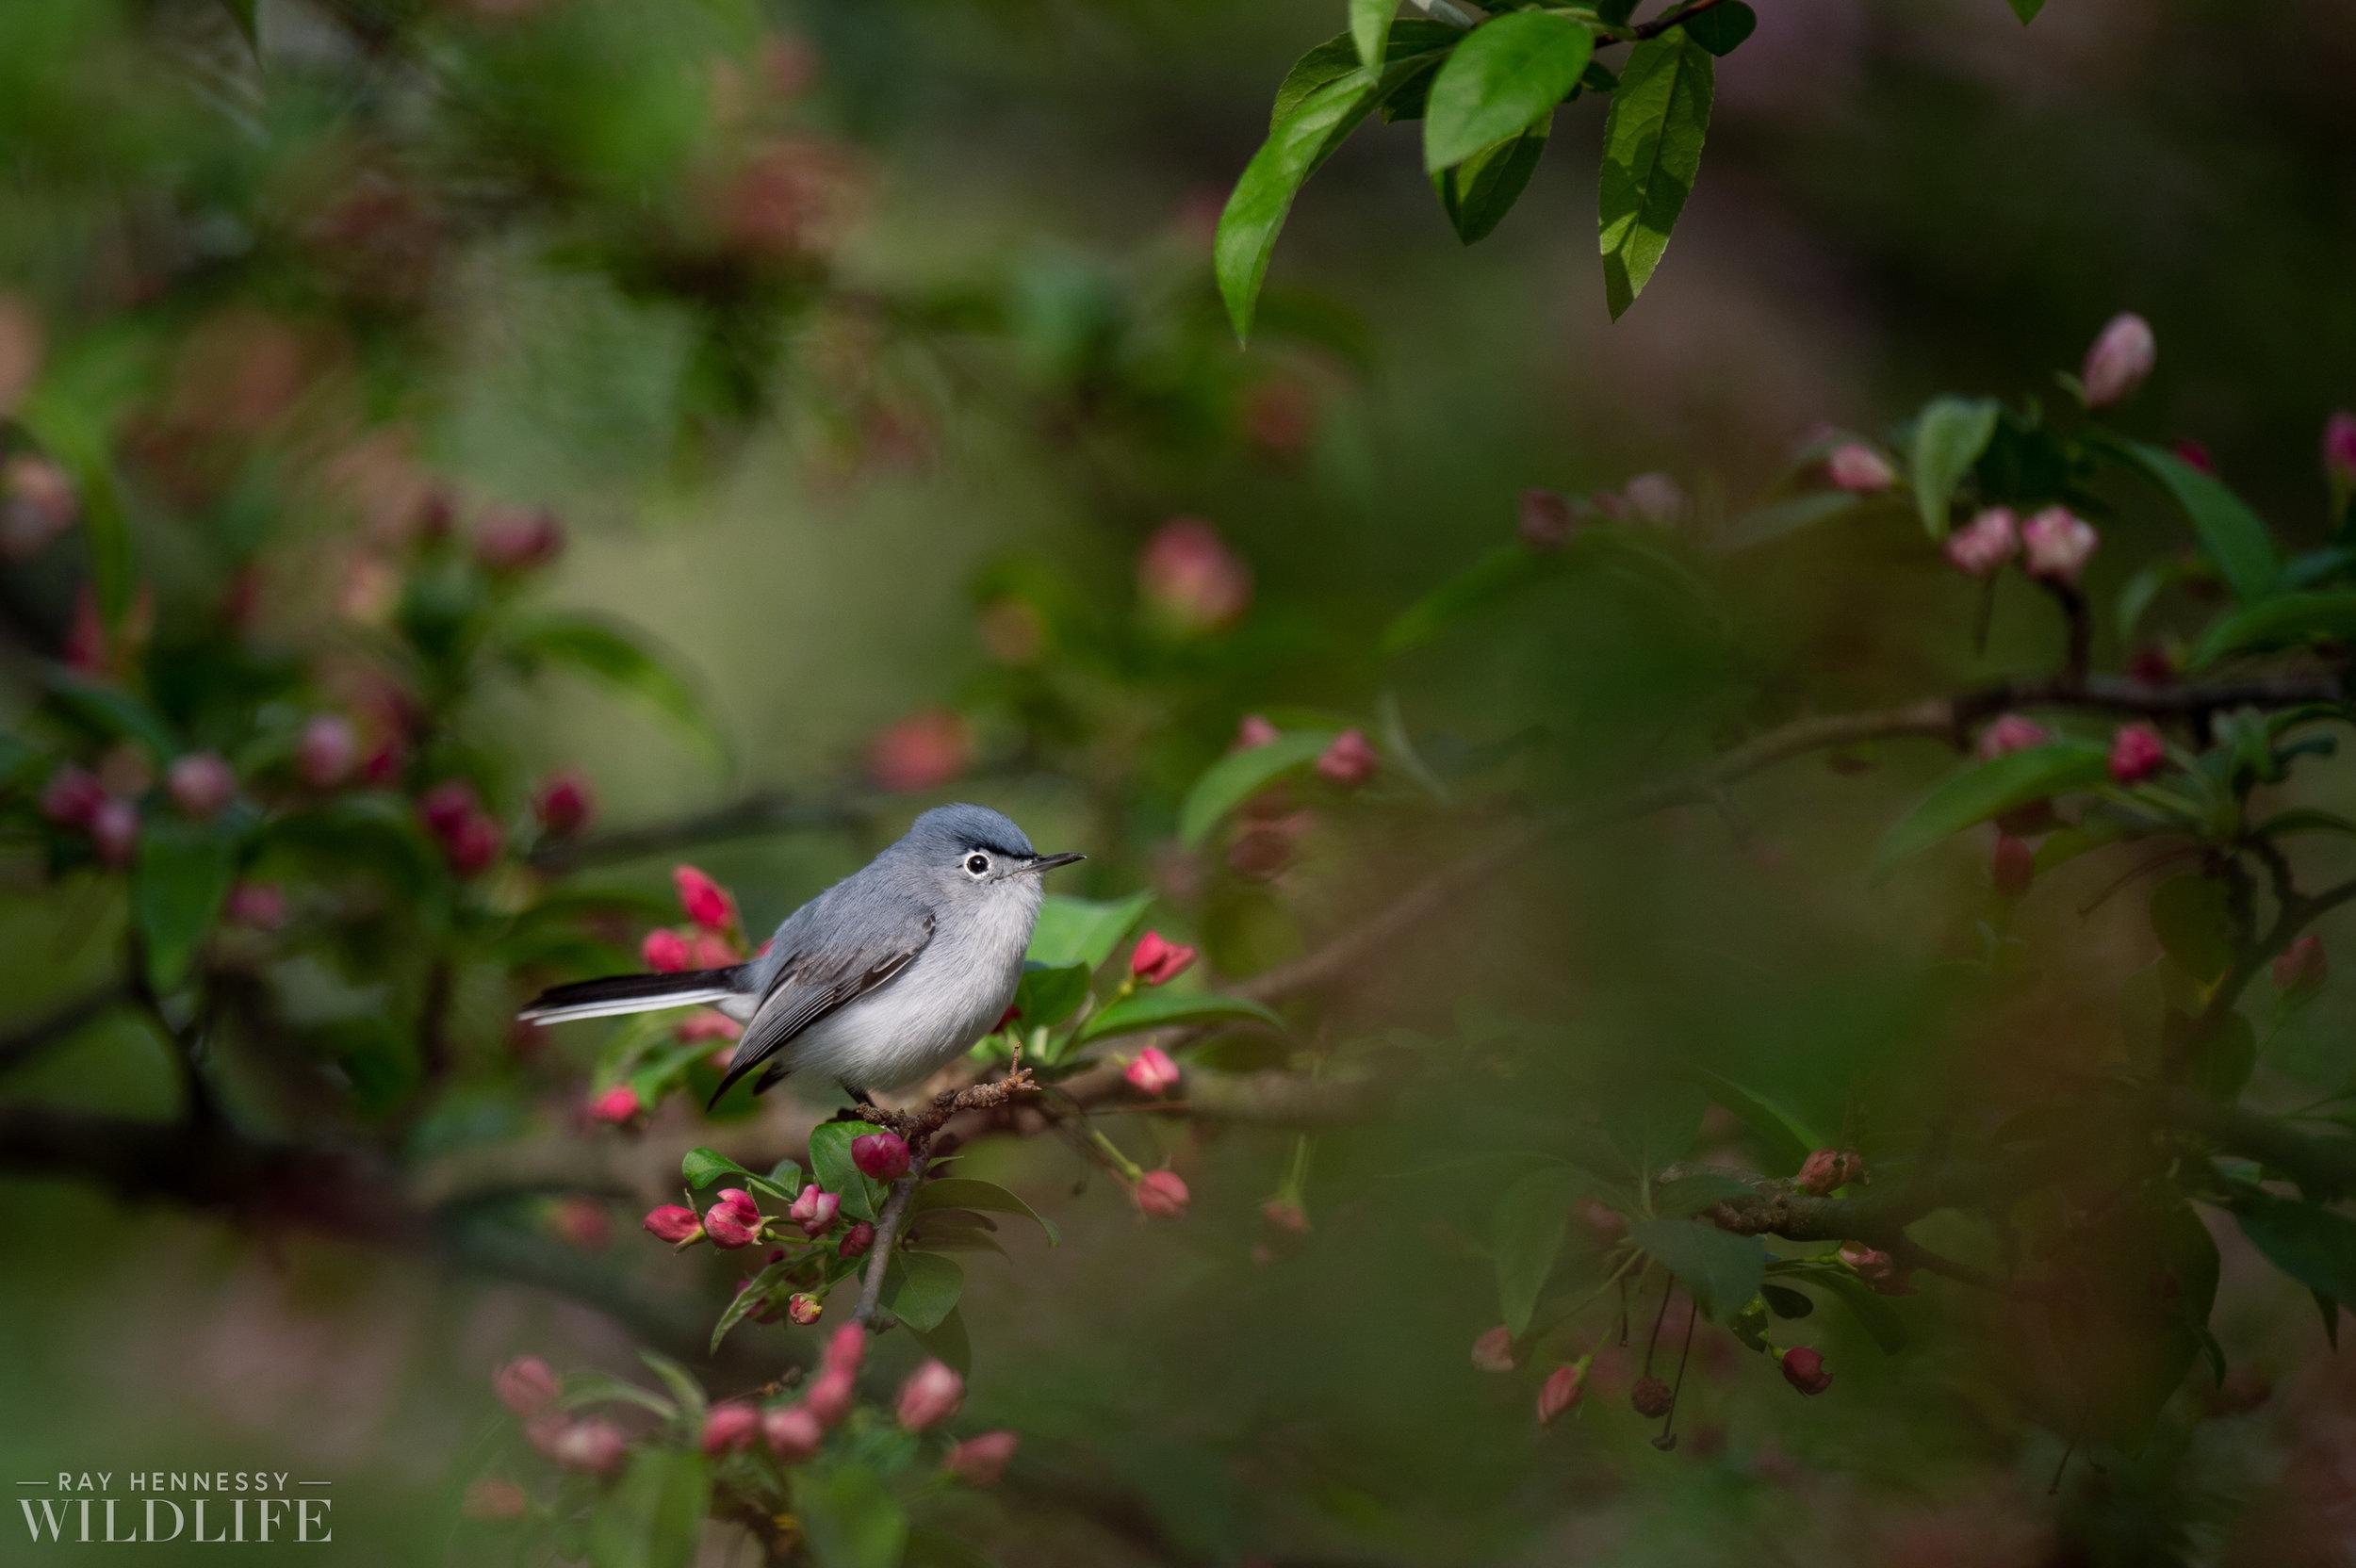 028_spring-warblers-new-jersey.jpg